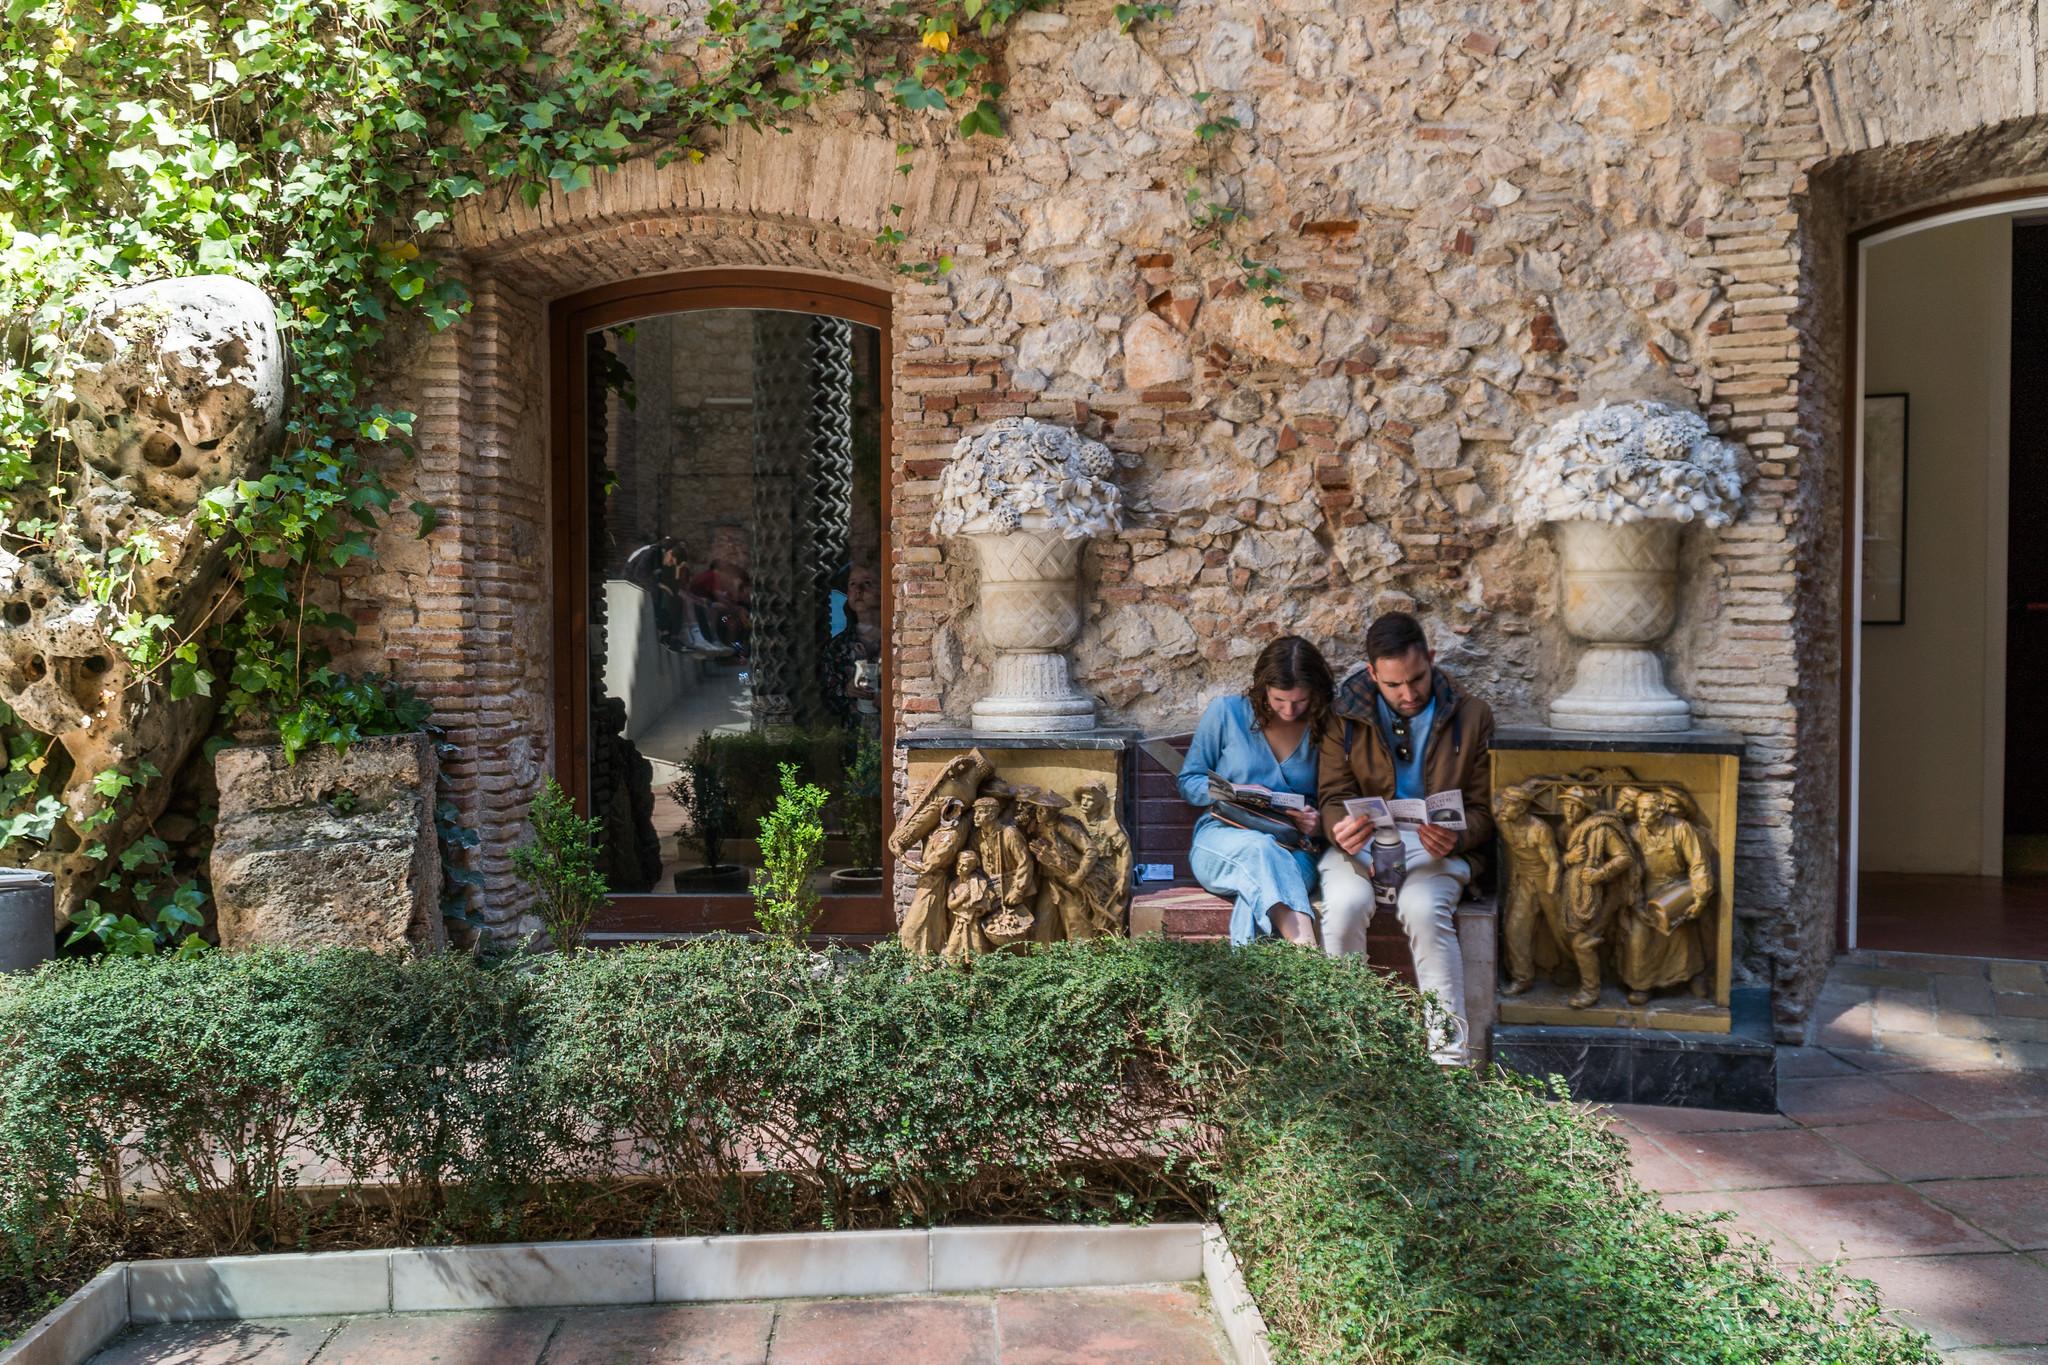 una coppia legge la piantina del museo